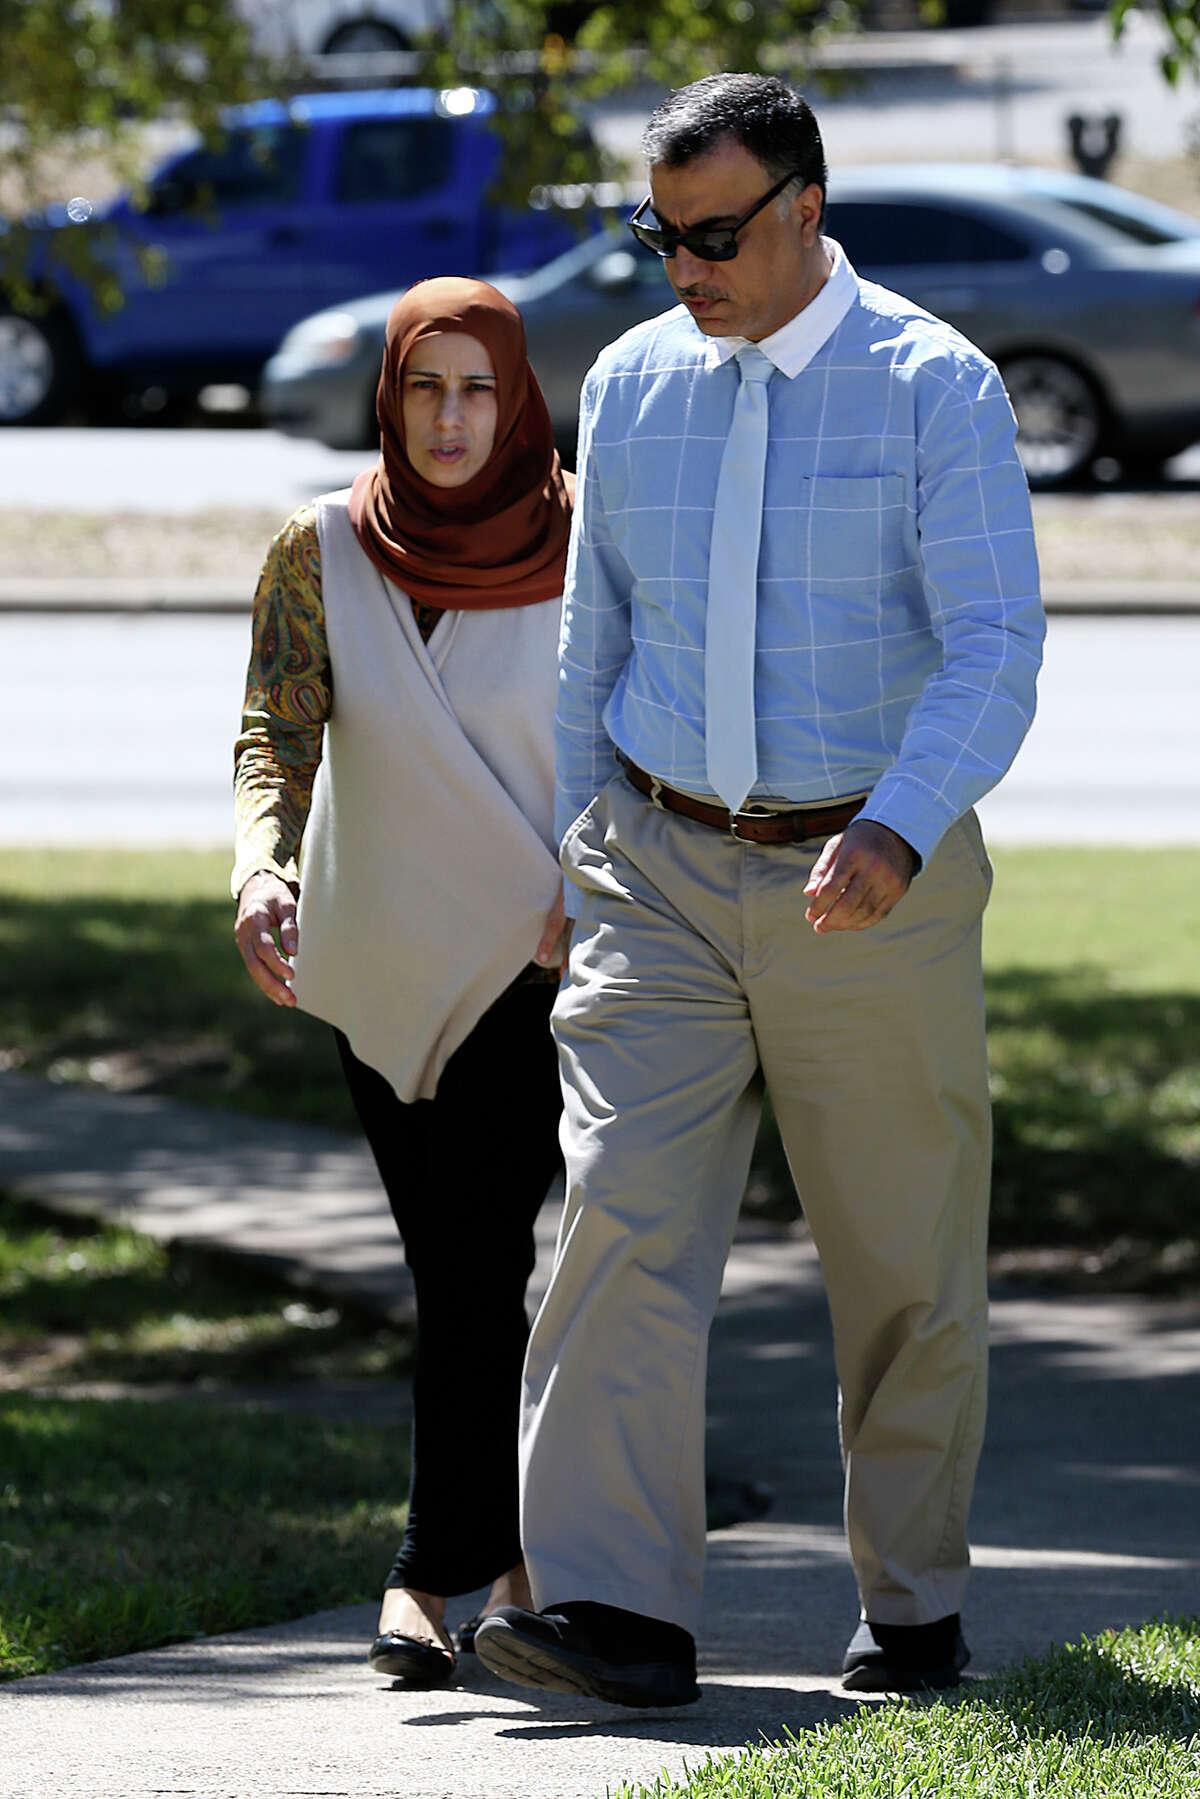 Qatar official Hassan Al Homoud and his wife, Zainab Al Hosani walk into Federal Court, Wednesday, Oct. 14, 2015.